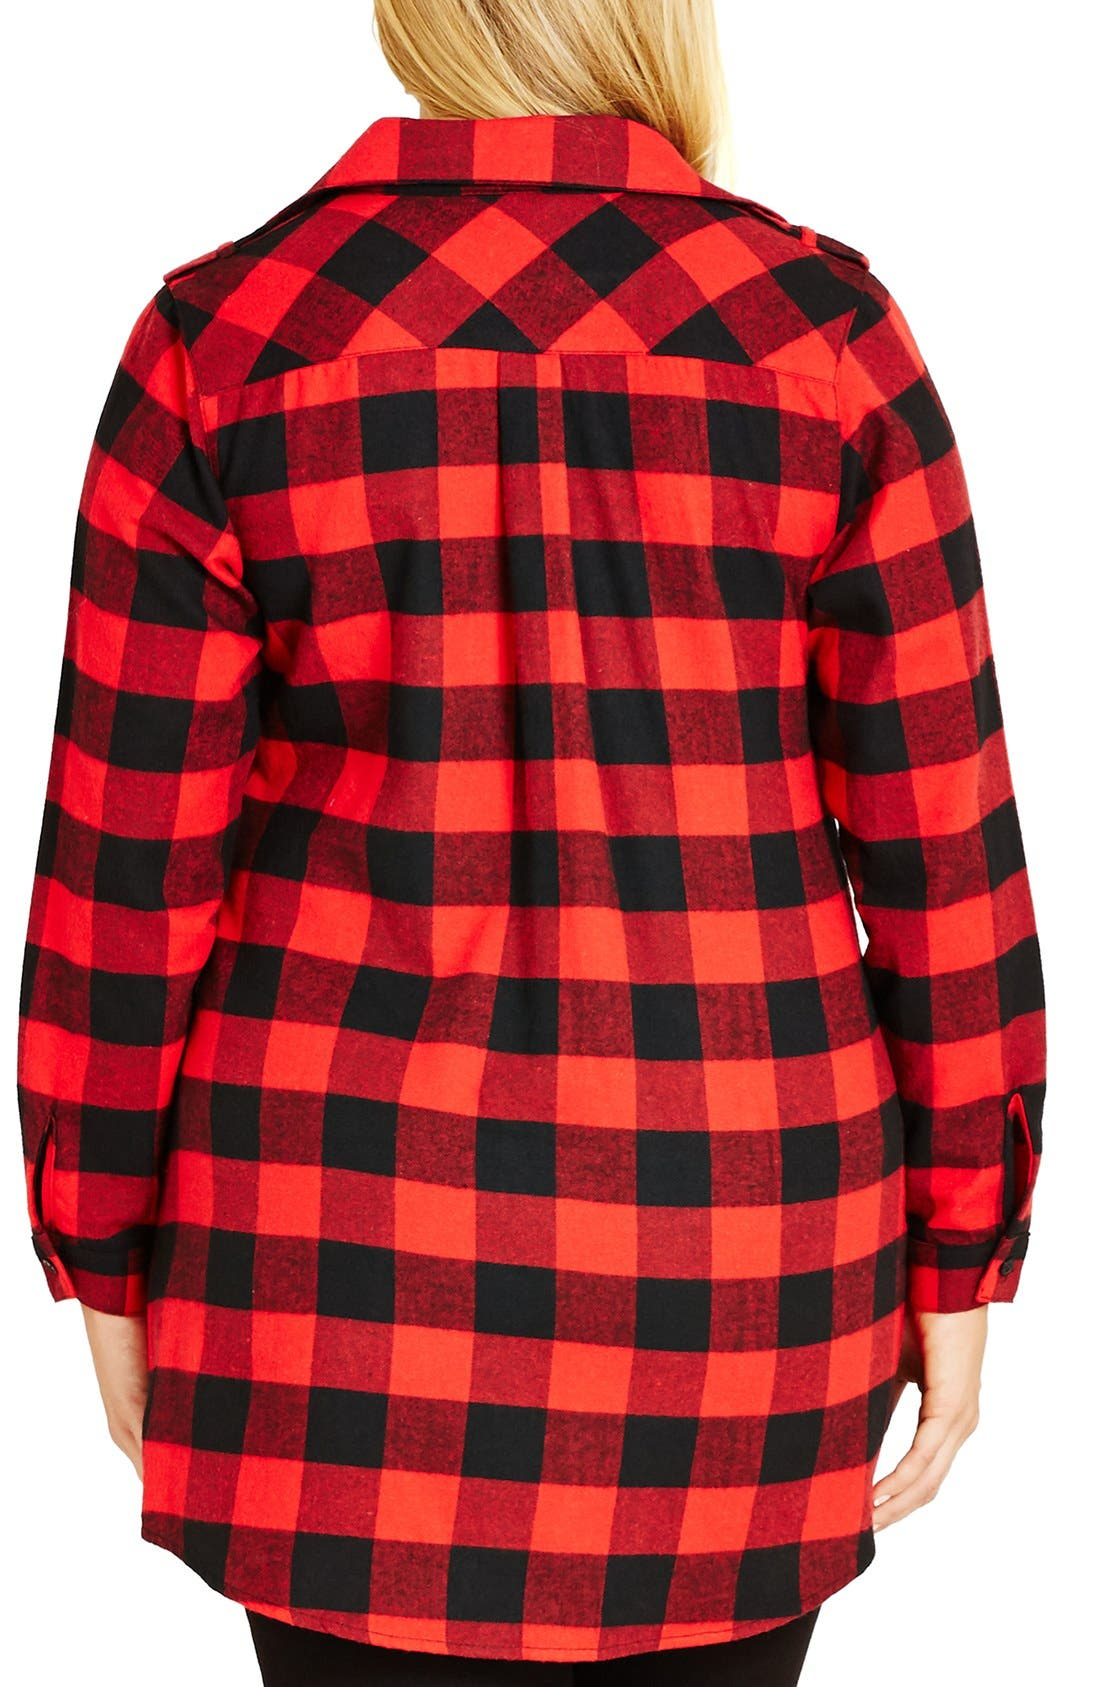 Alternate Image 2  - City Chic Plaid Boyfriend Shirt (Plus Size)